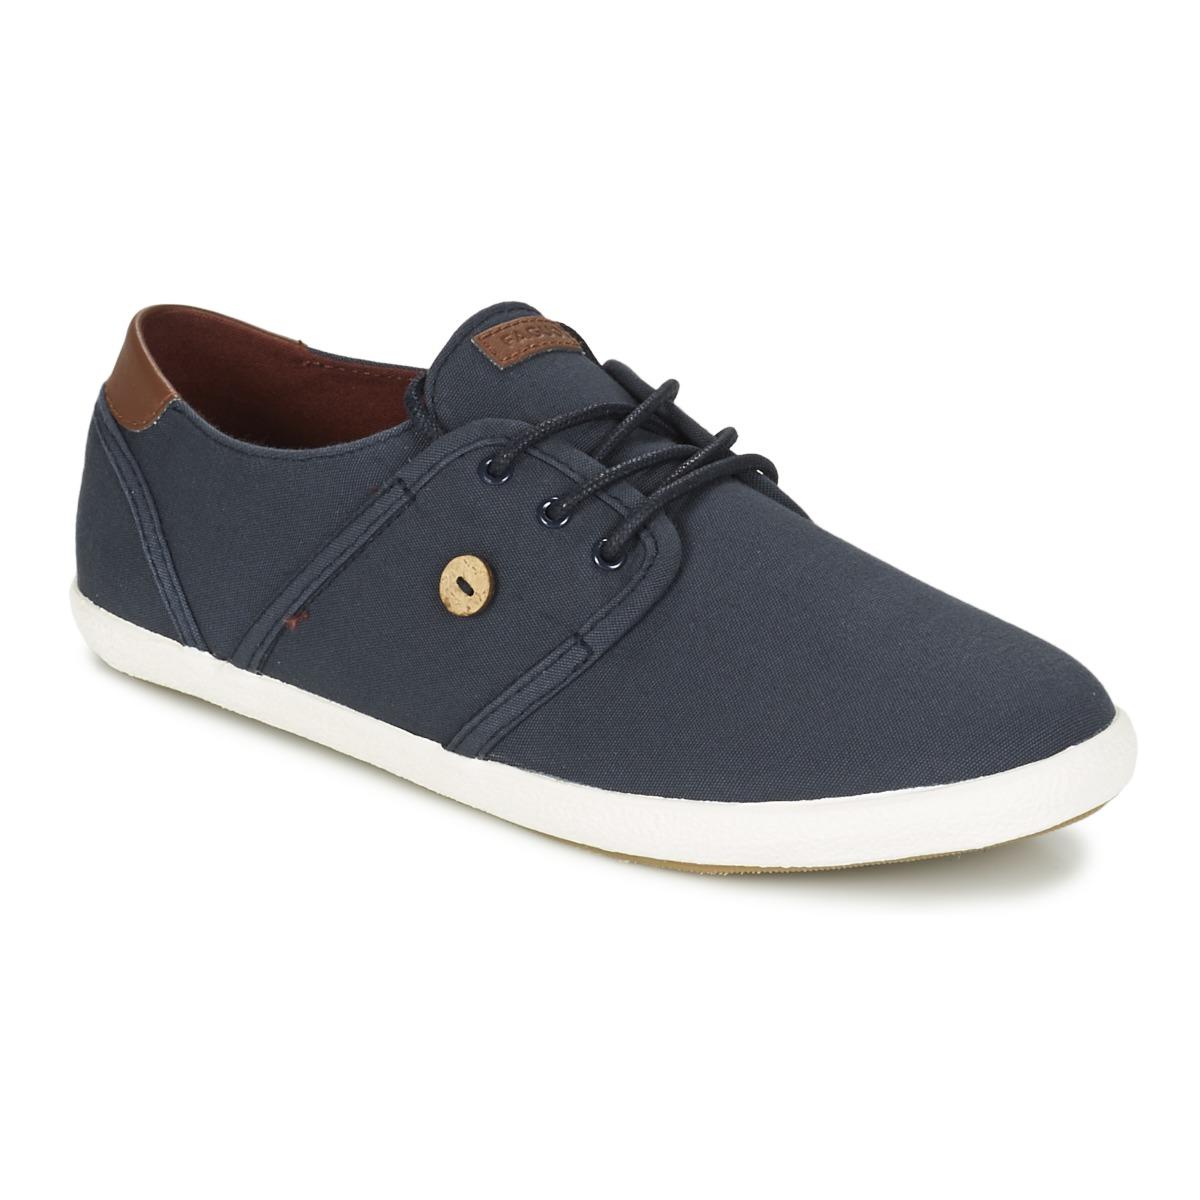 Faguo CYPRESS Marine - Kostenloser Versand bei Spartoode ! - Schuhe Sneaker Low  52,00 €